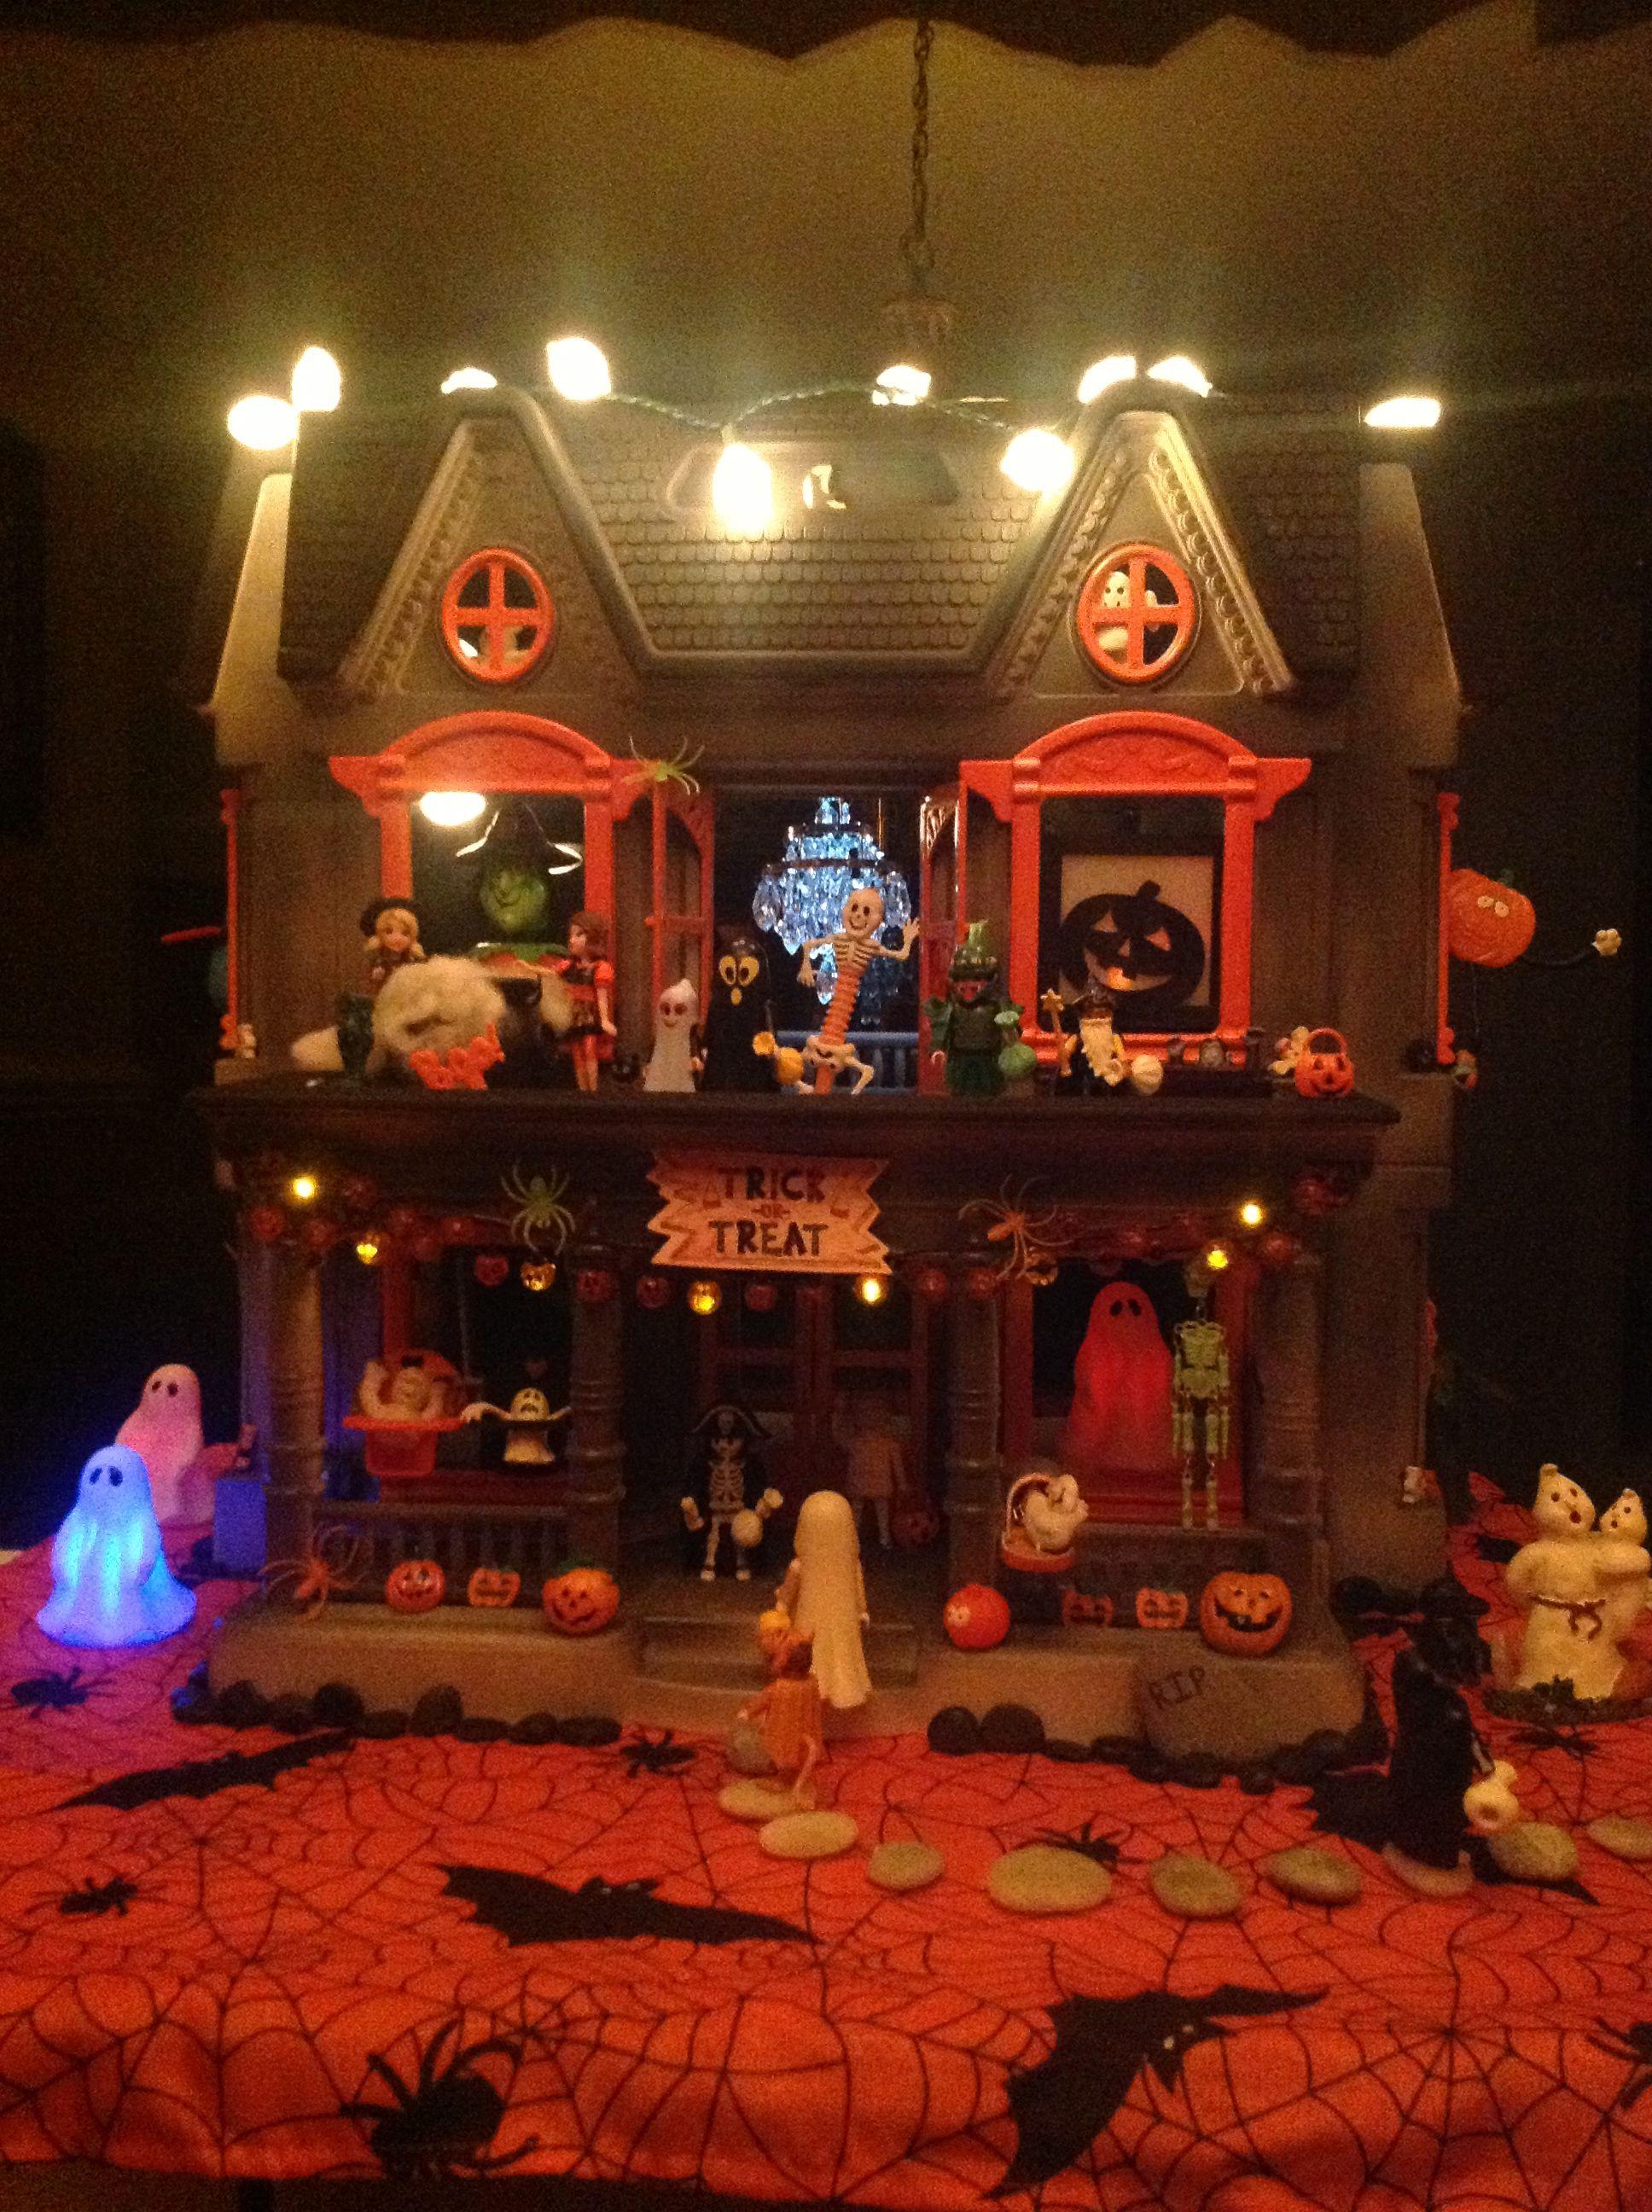 Old dollhouse into Halloween haunted house #haunteddollhouse